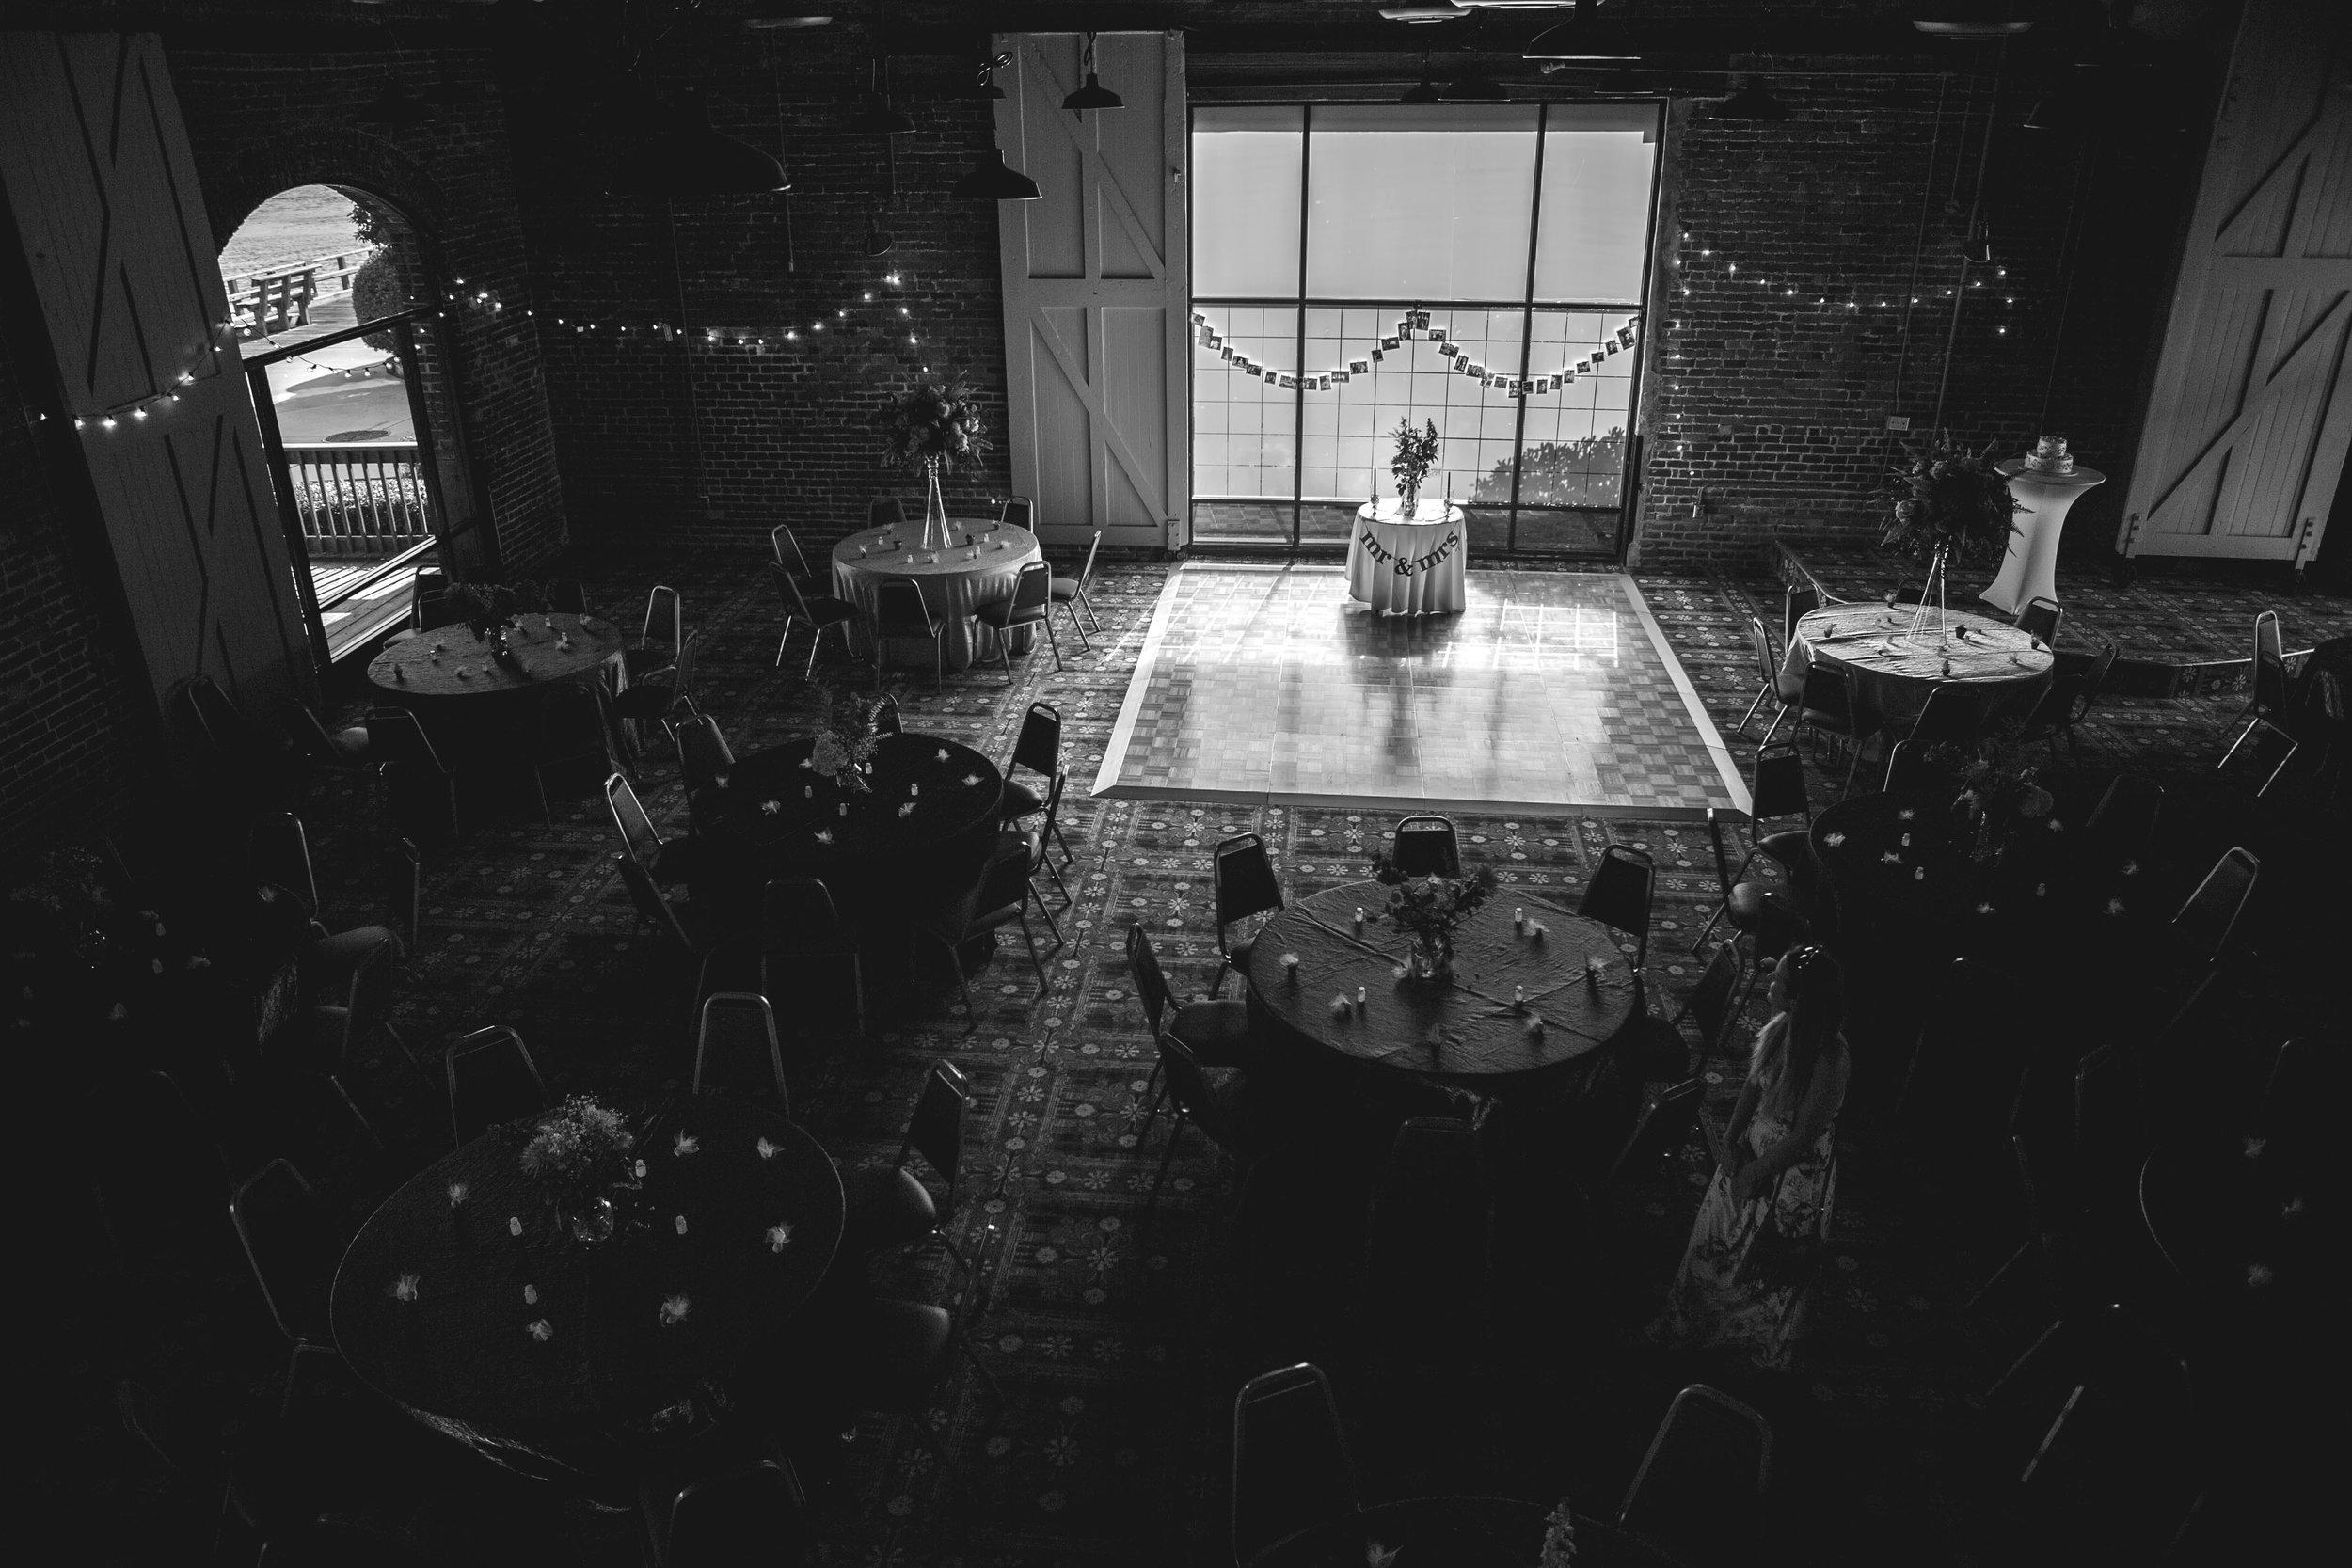 North_Carolina_Wedding_Photographer_Tiffany_Abruzzo_Reception_11.jpg